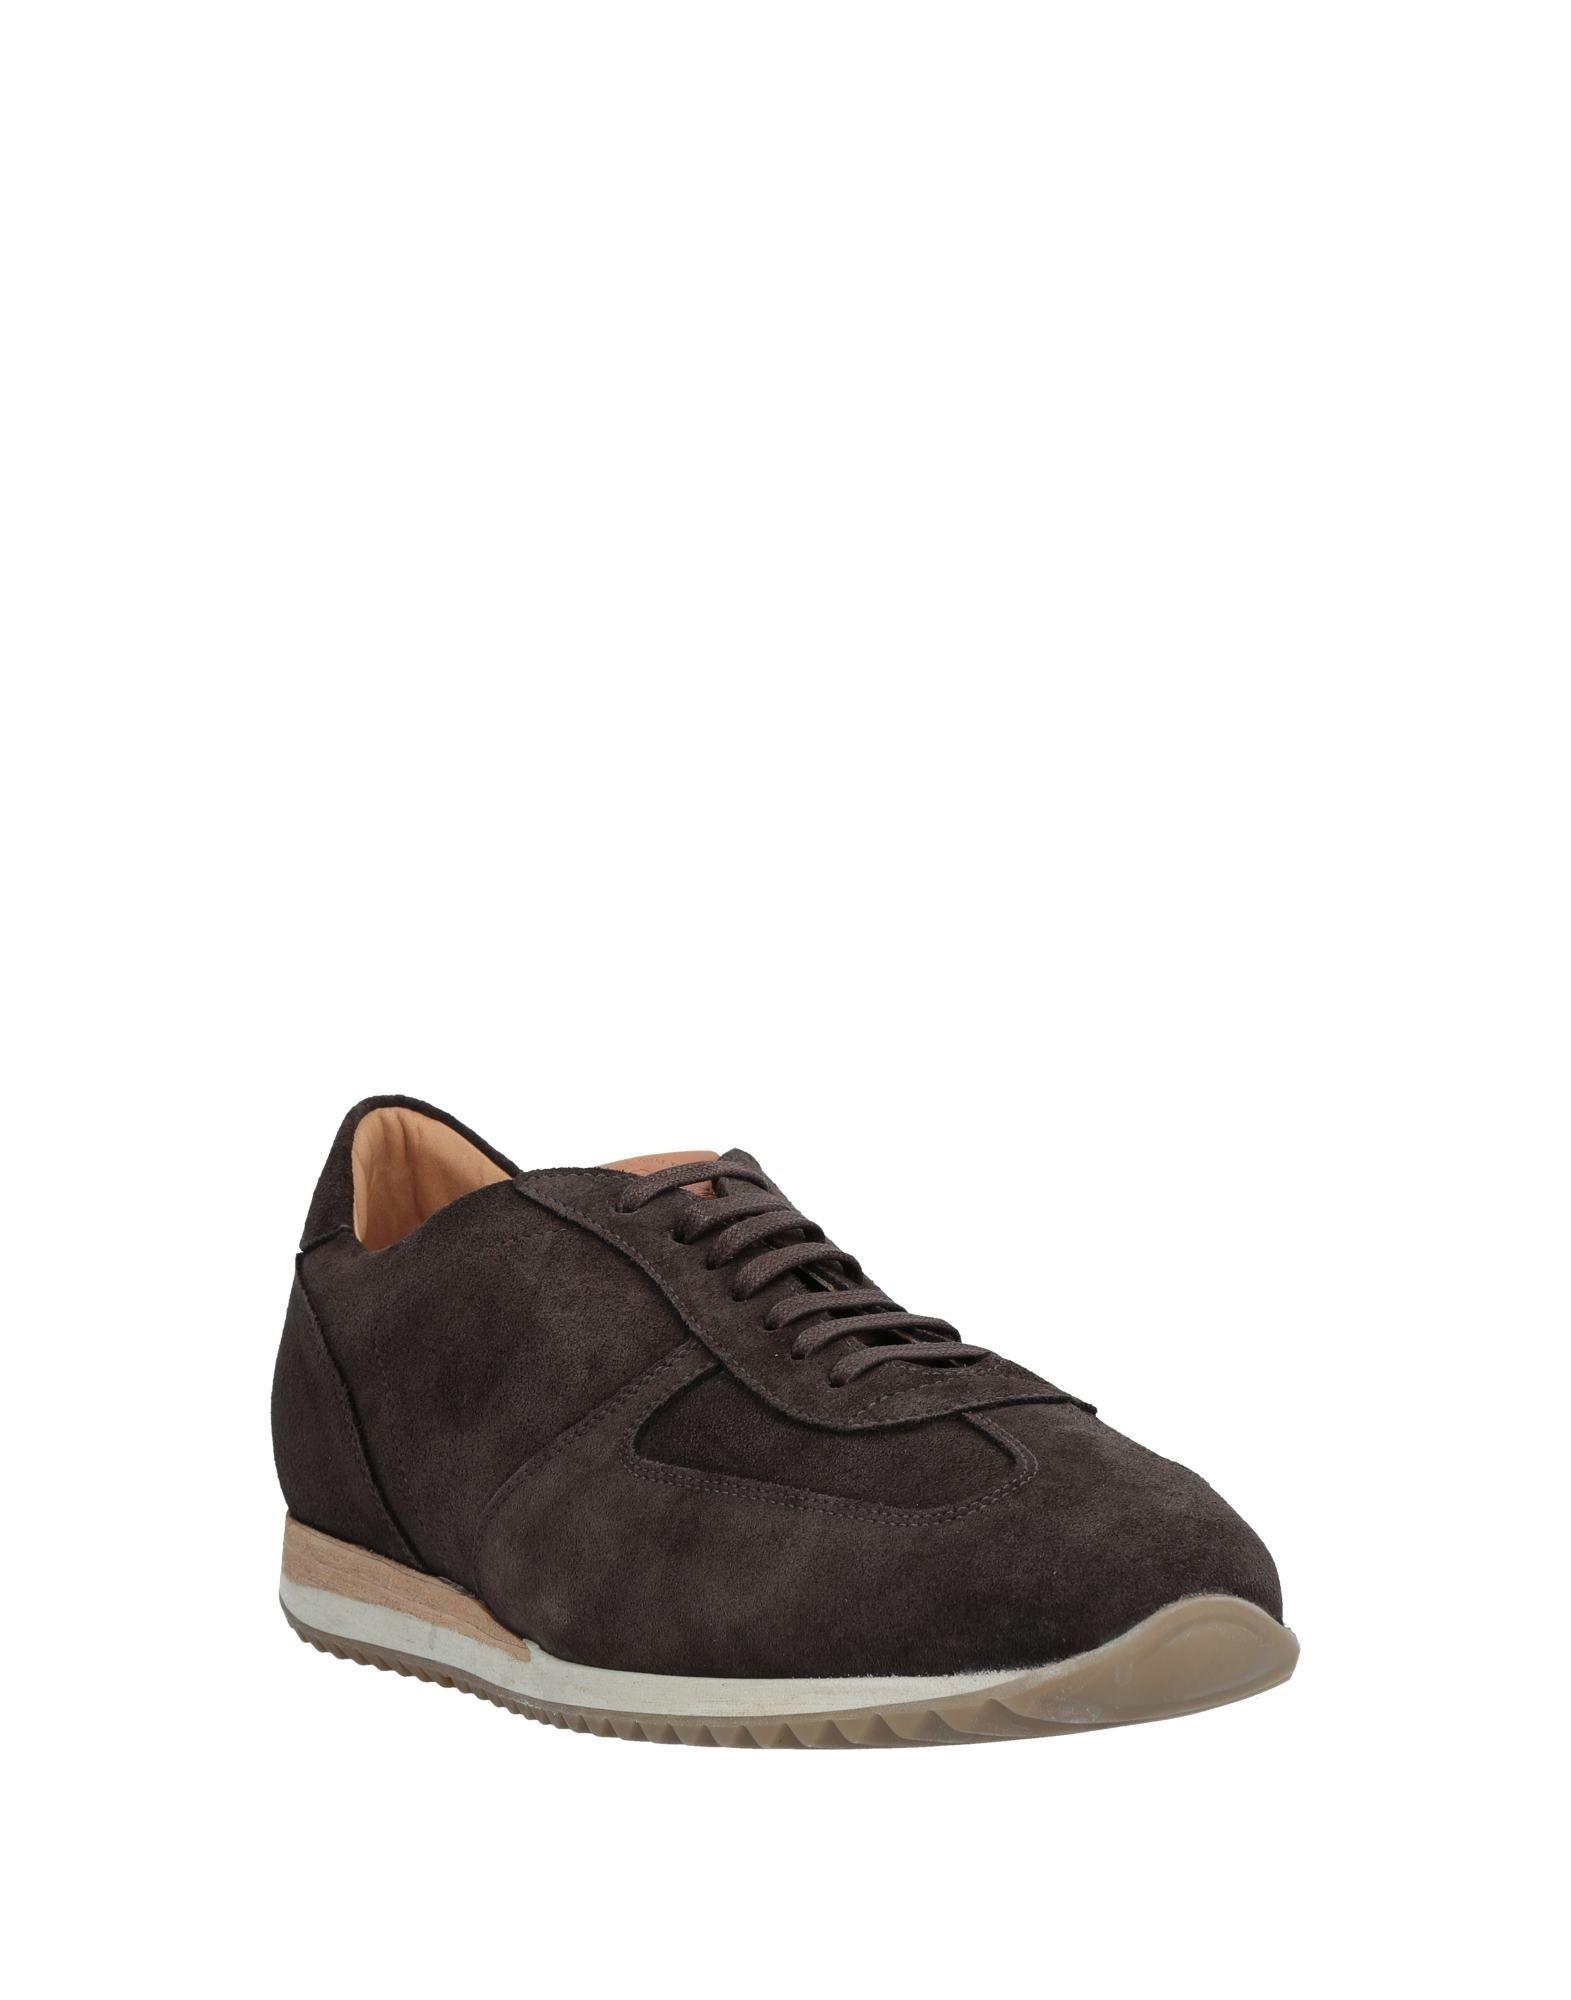 Sneakers Franceschetti Uomo - 11533553AM 11533553AM 11533553AM elegante de140f